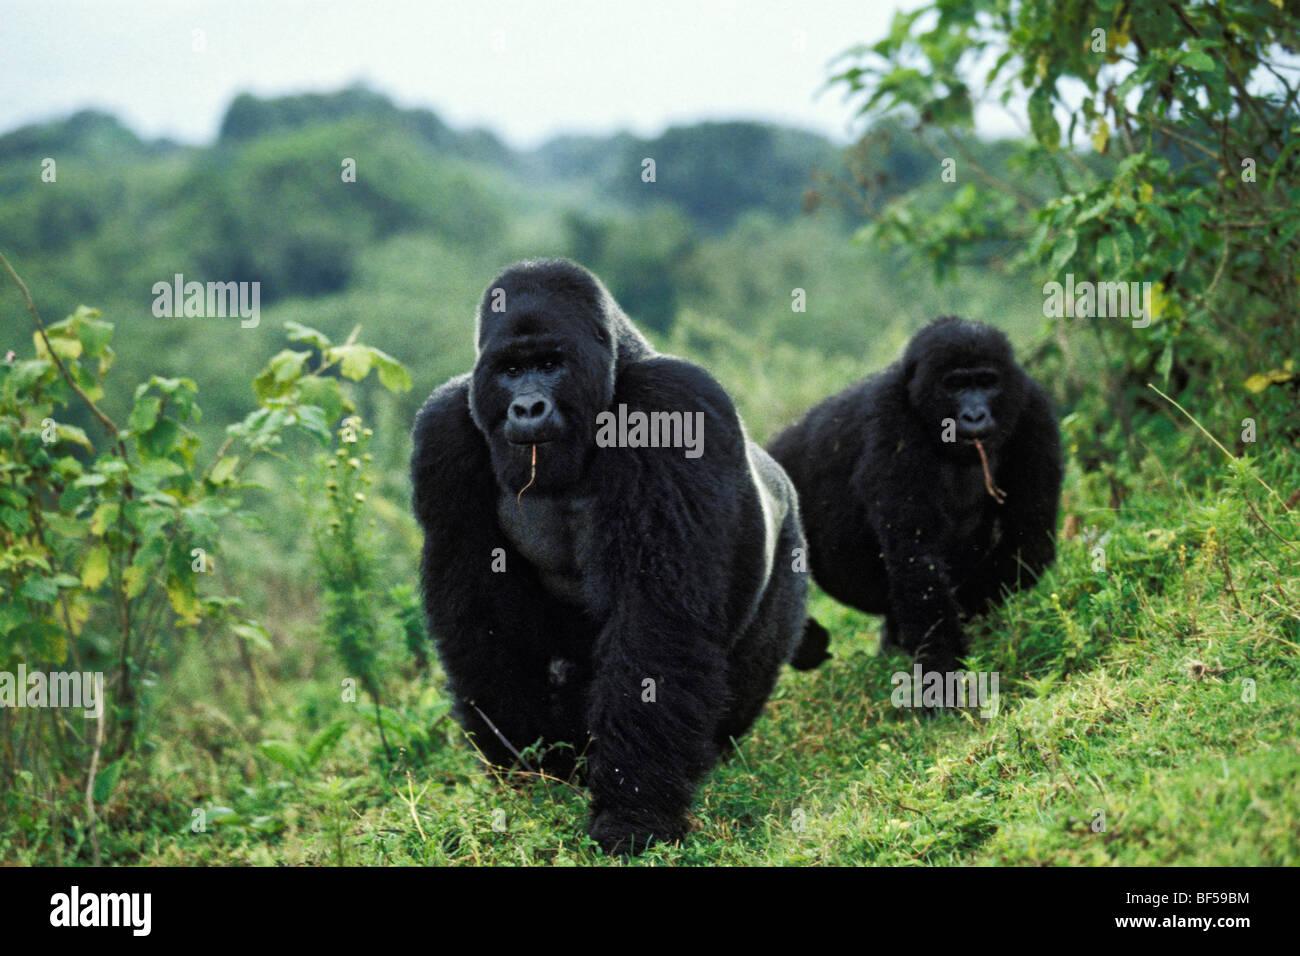 Mountain gorillas (Gorilla beringei), foraging, Virunga Nationalpark, Zaire - Stock Image